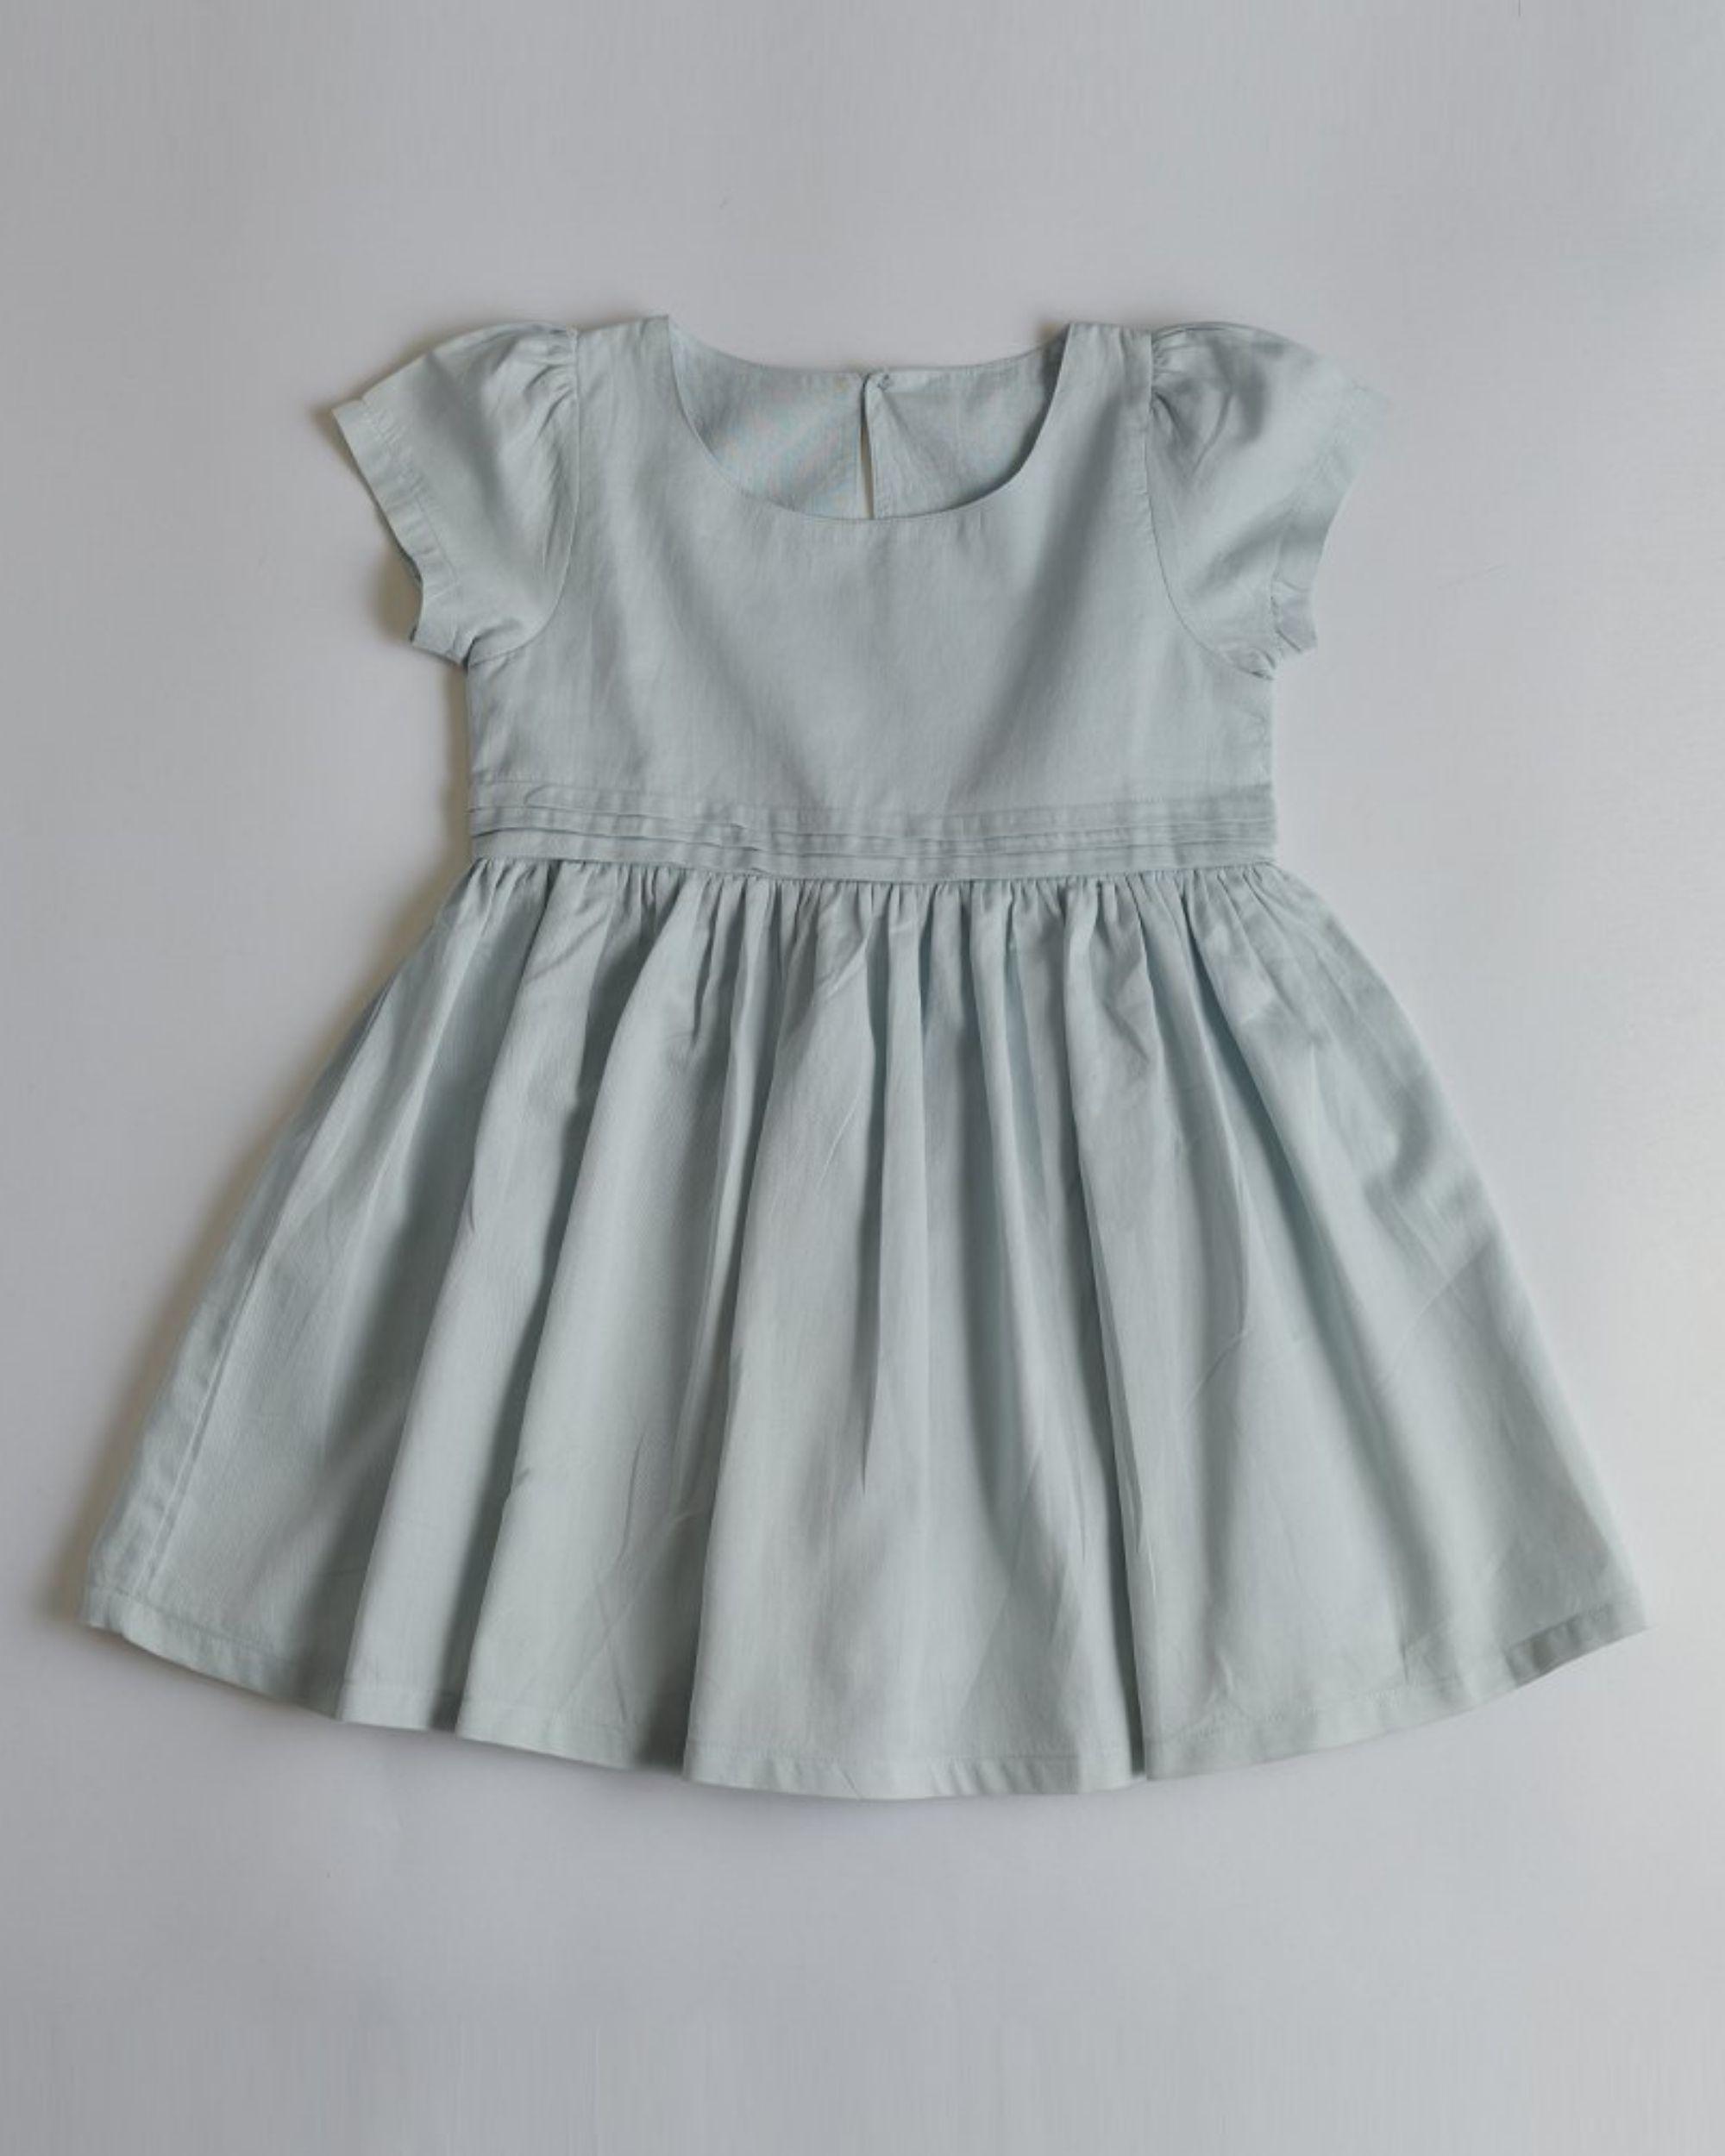 Powder blue panelled dress